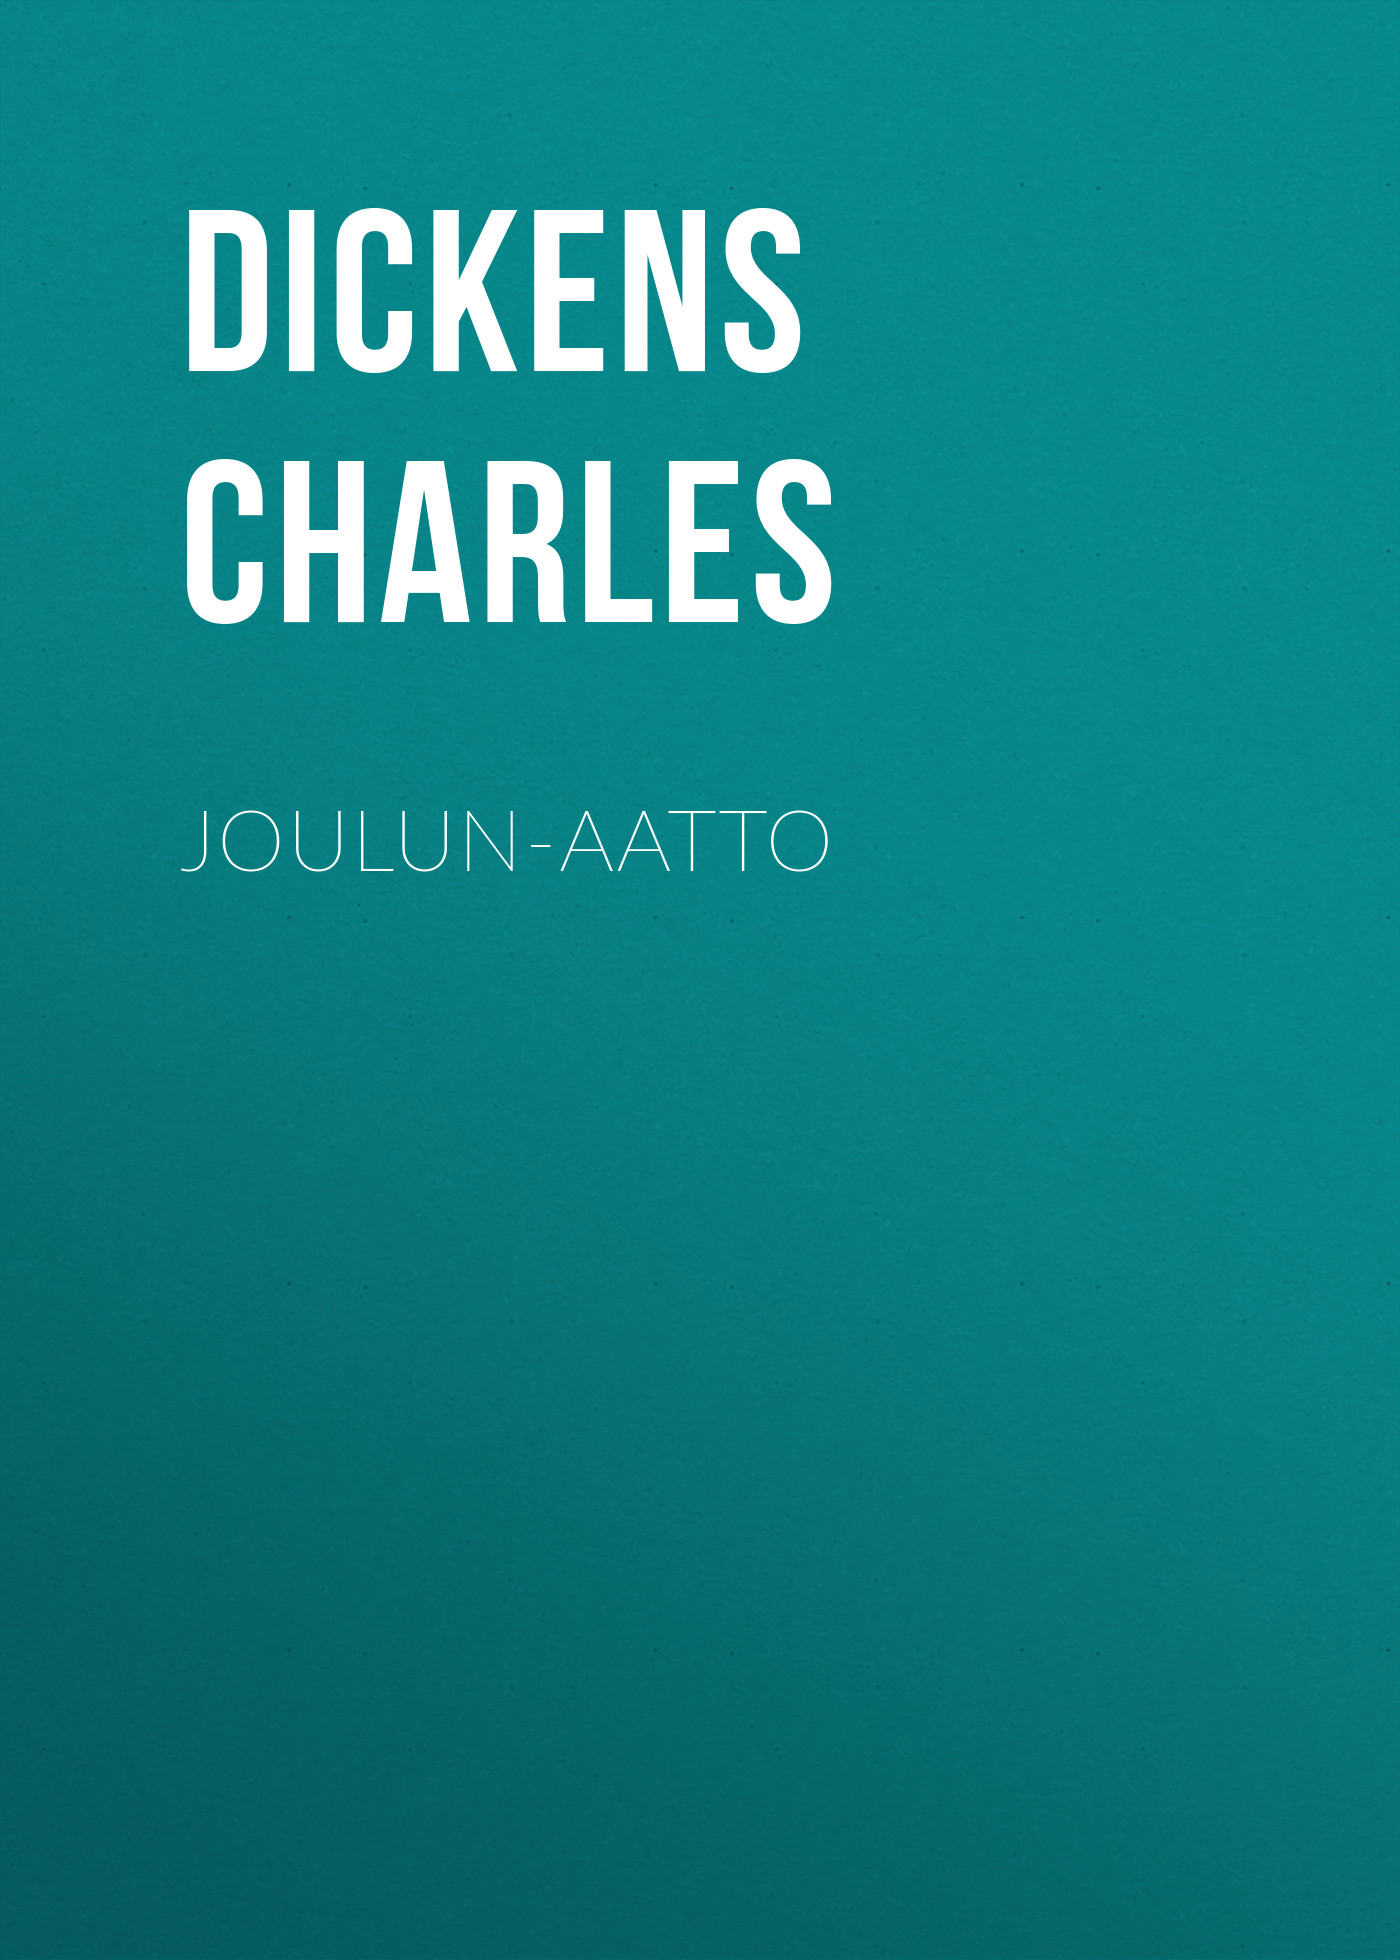 Чарльз Диккенс Joulun-aatto чарльз диккенс принц бык